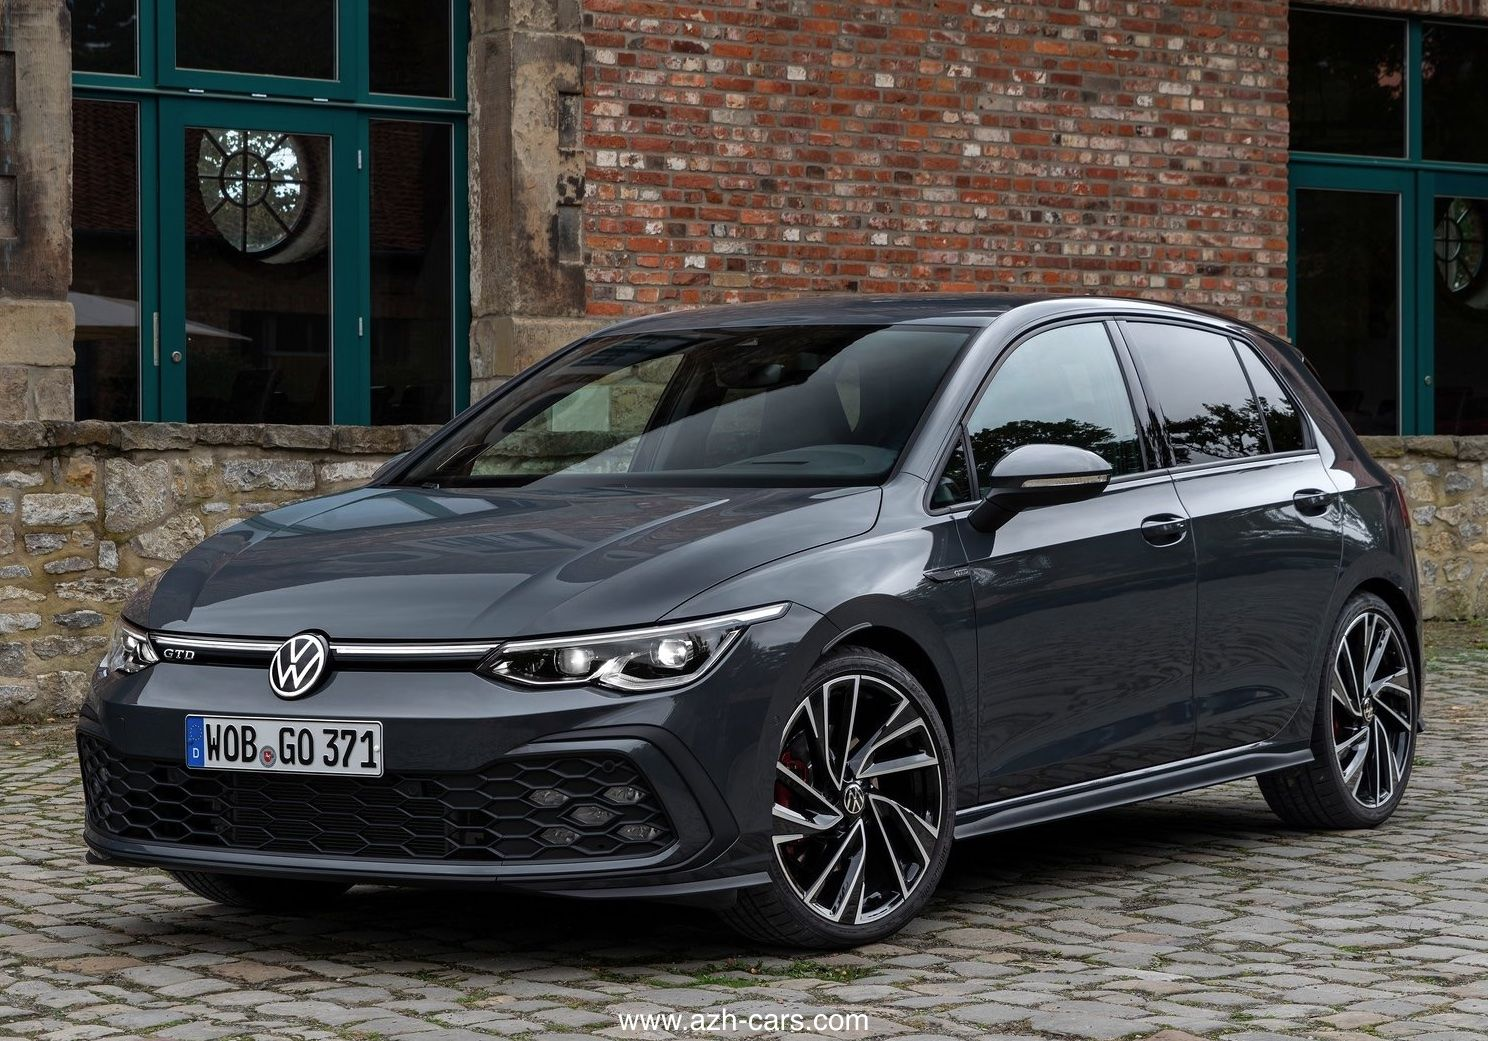 Volkswagen Golf Gtd 2021 In 2021 Volkswagen Golf Volkswagen Gtd